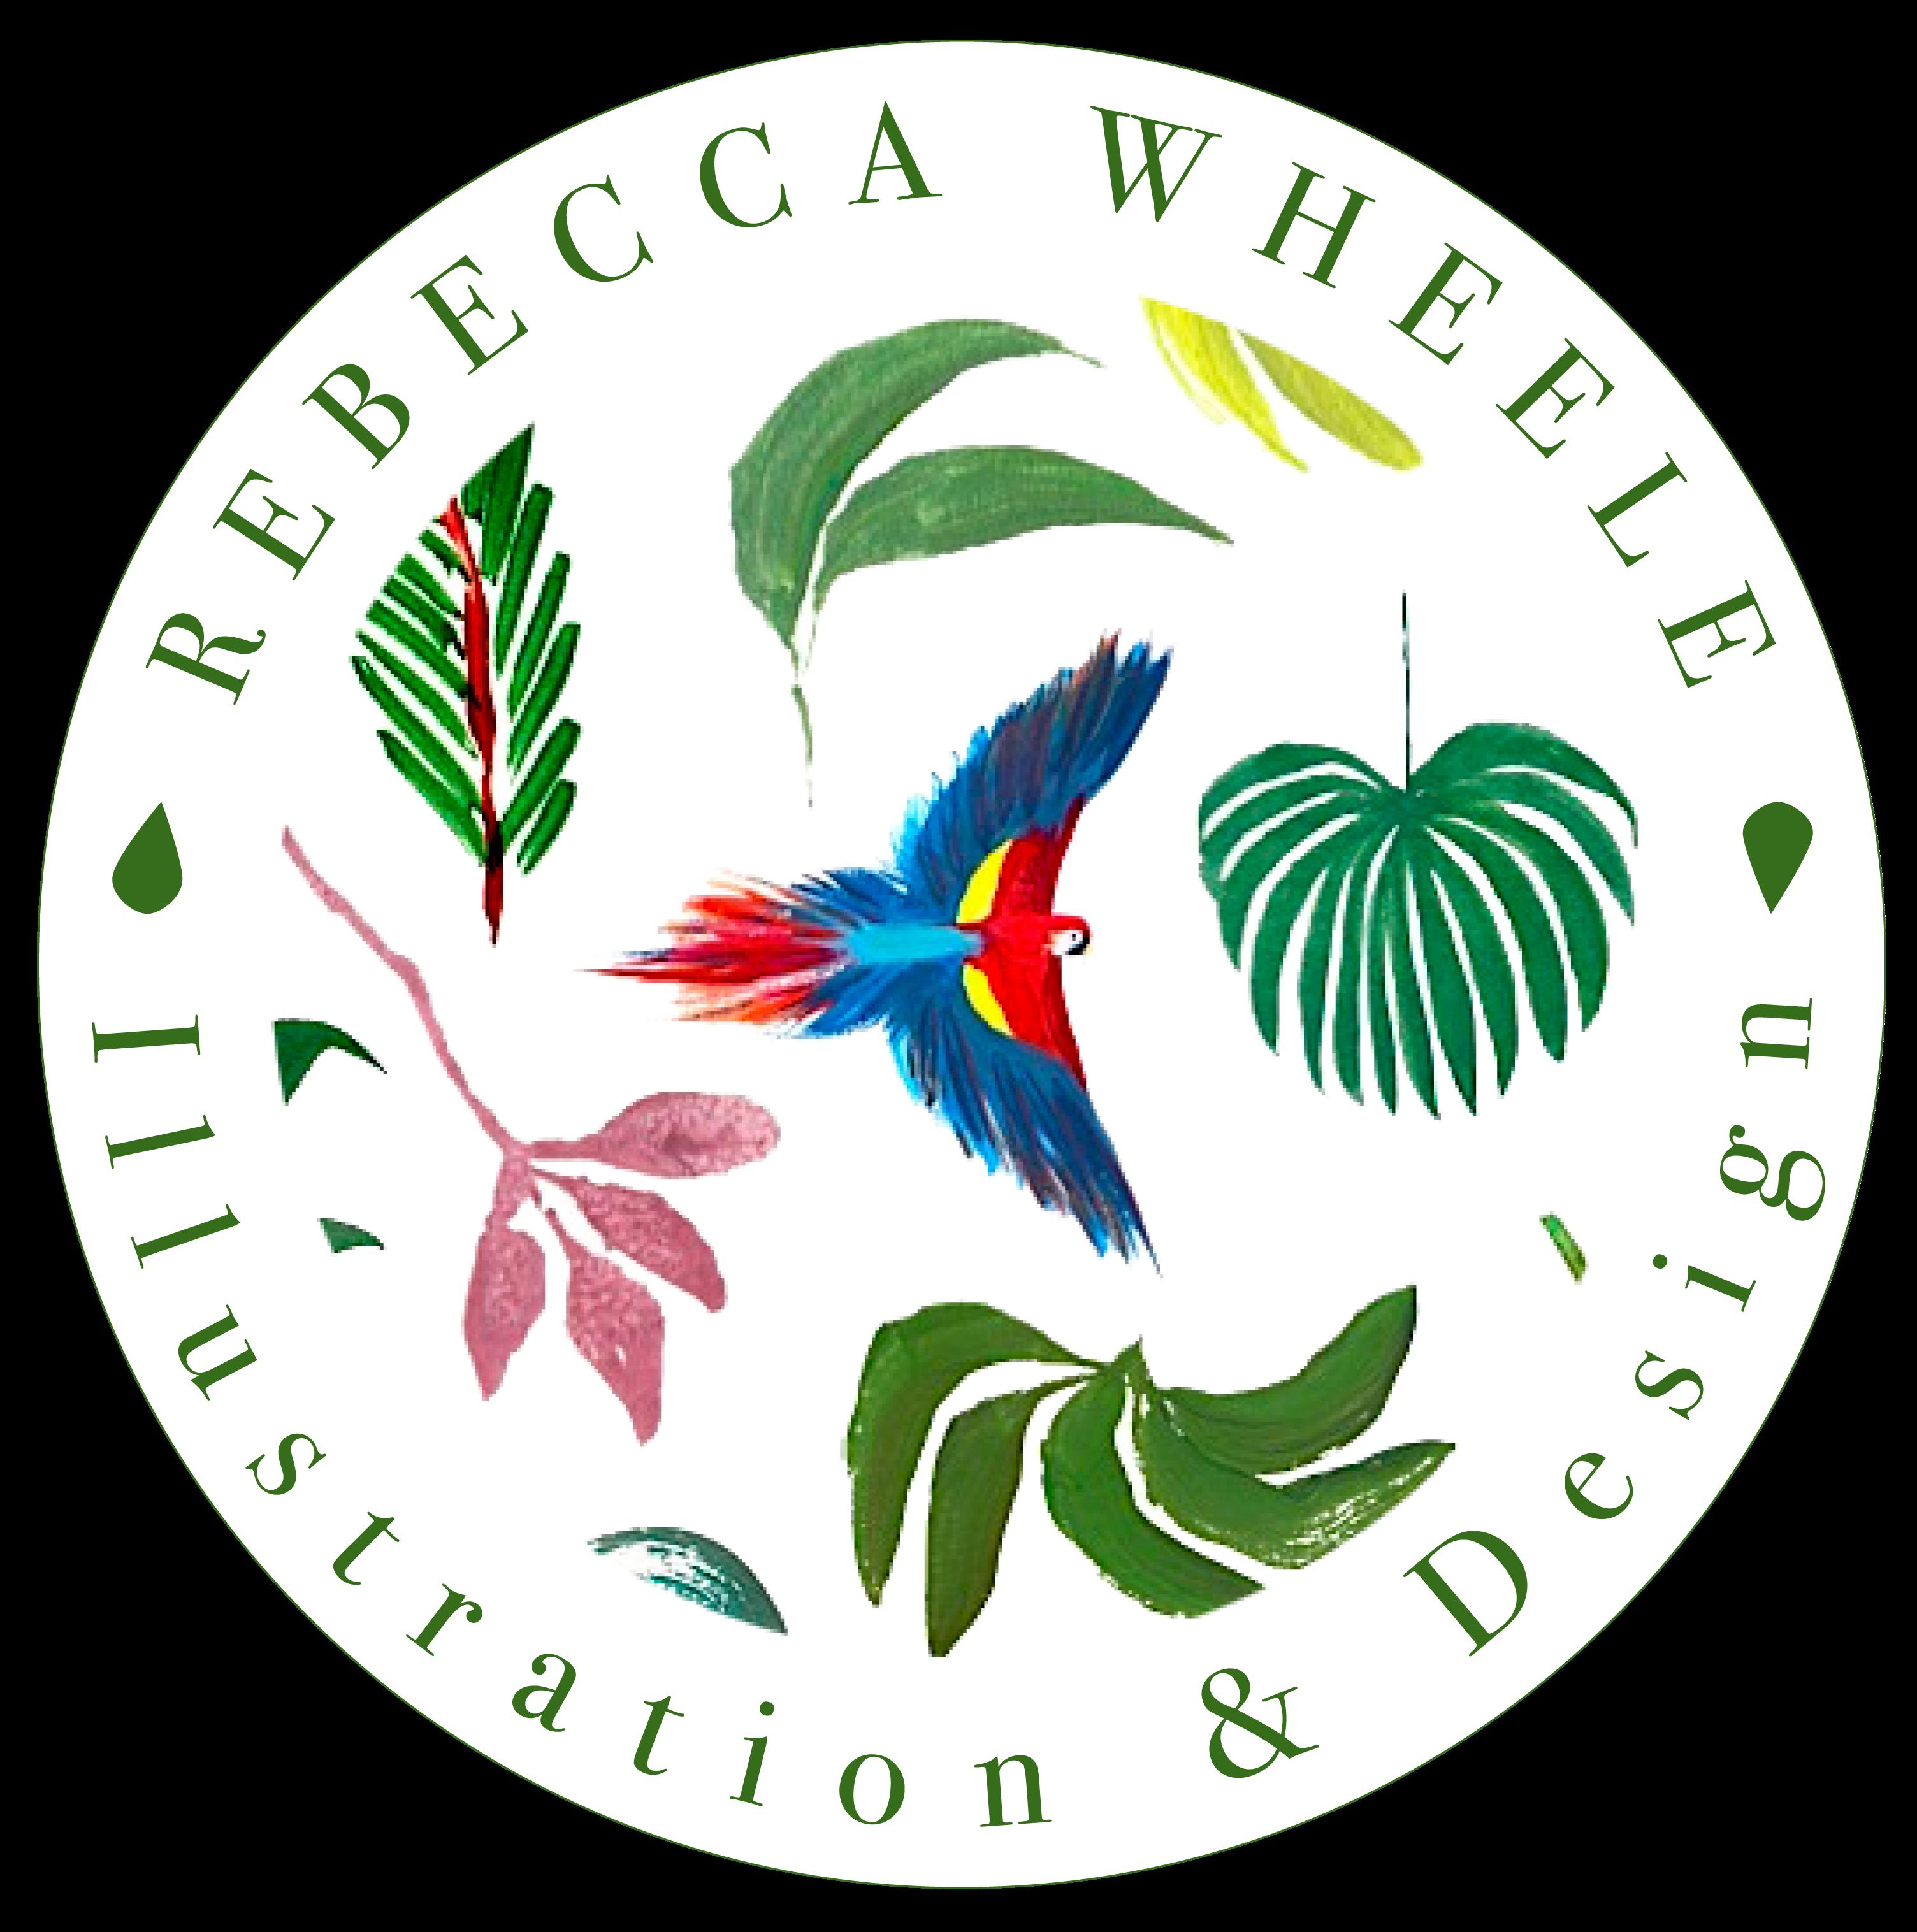 rebeccawheele